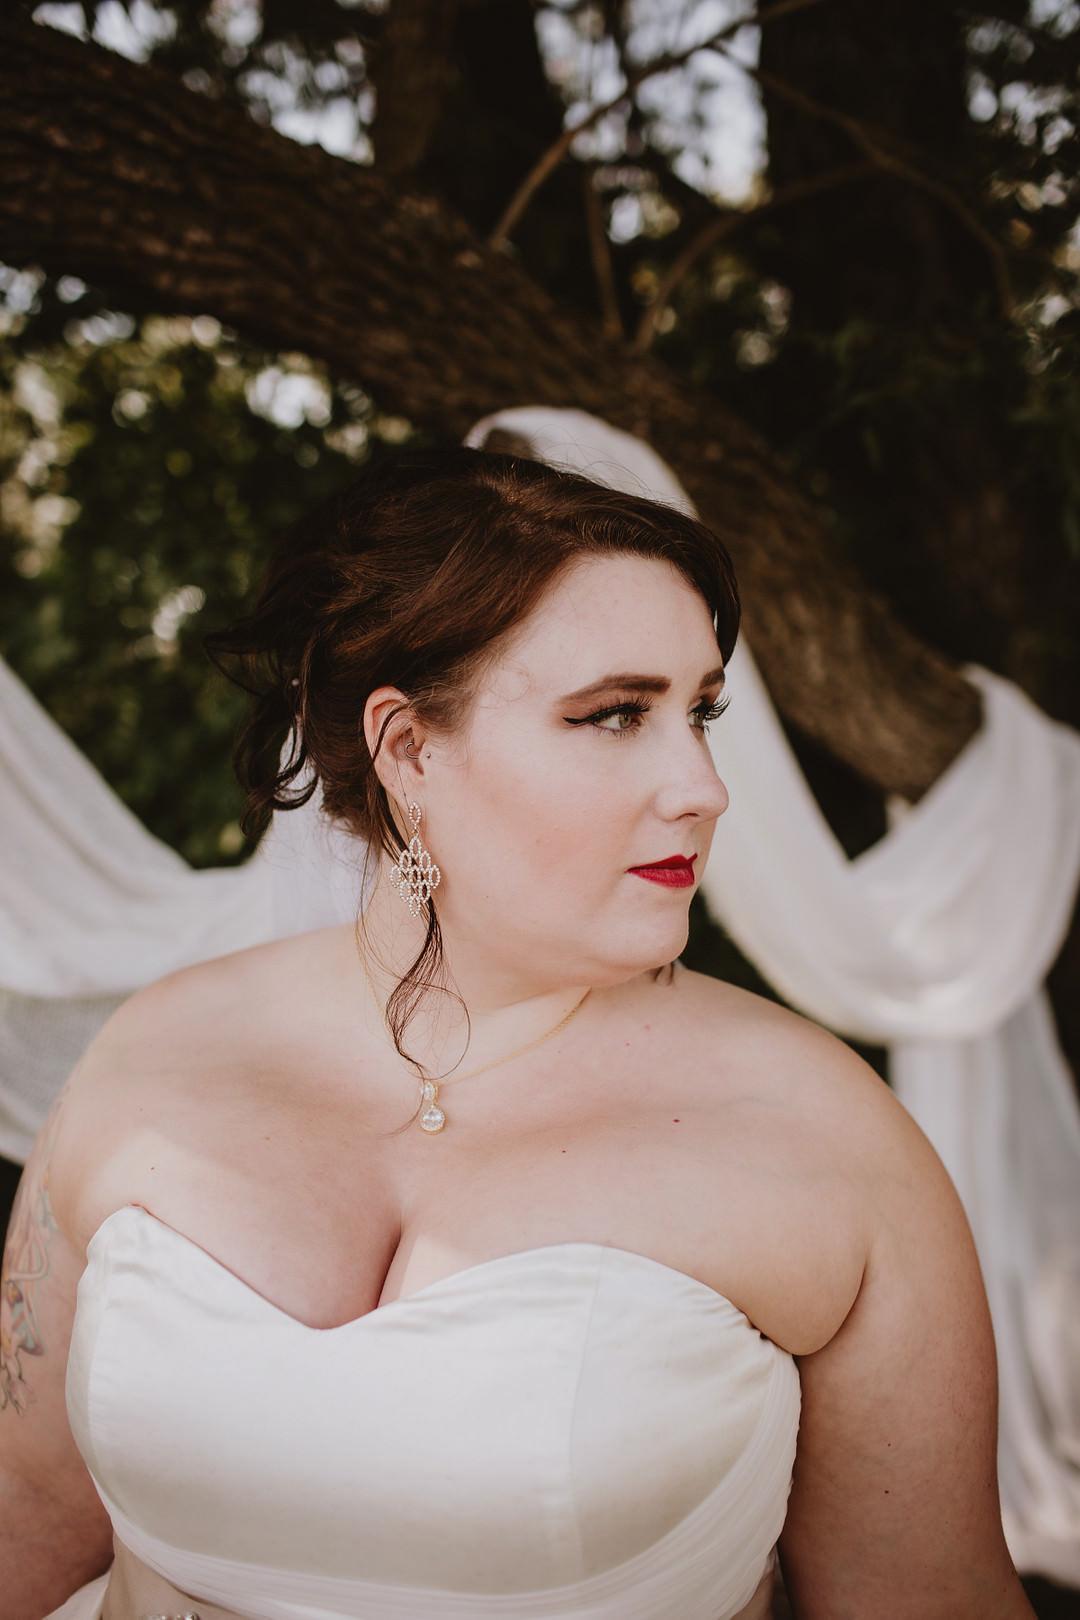 Bride Bridal Make Up Fairytale Forest Wedding Christina W Kroeker Creative